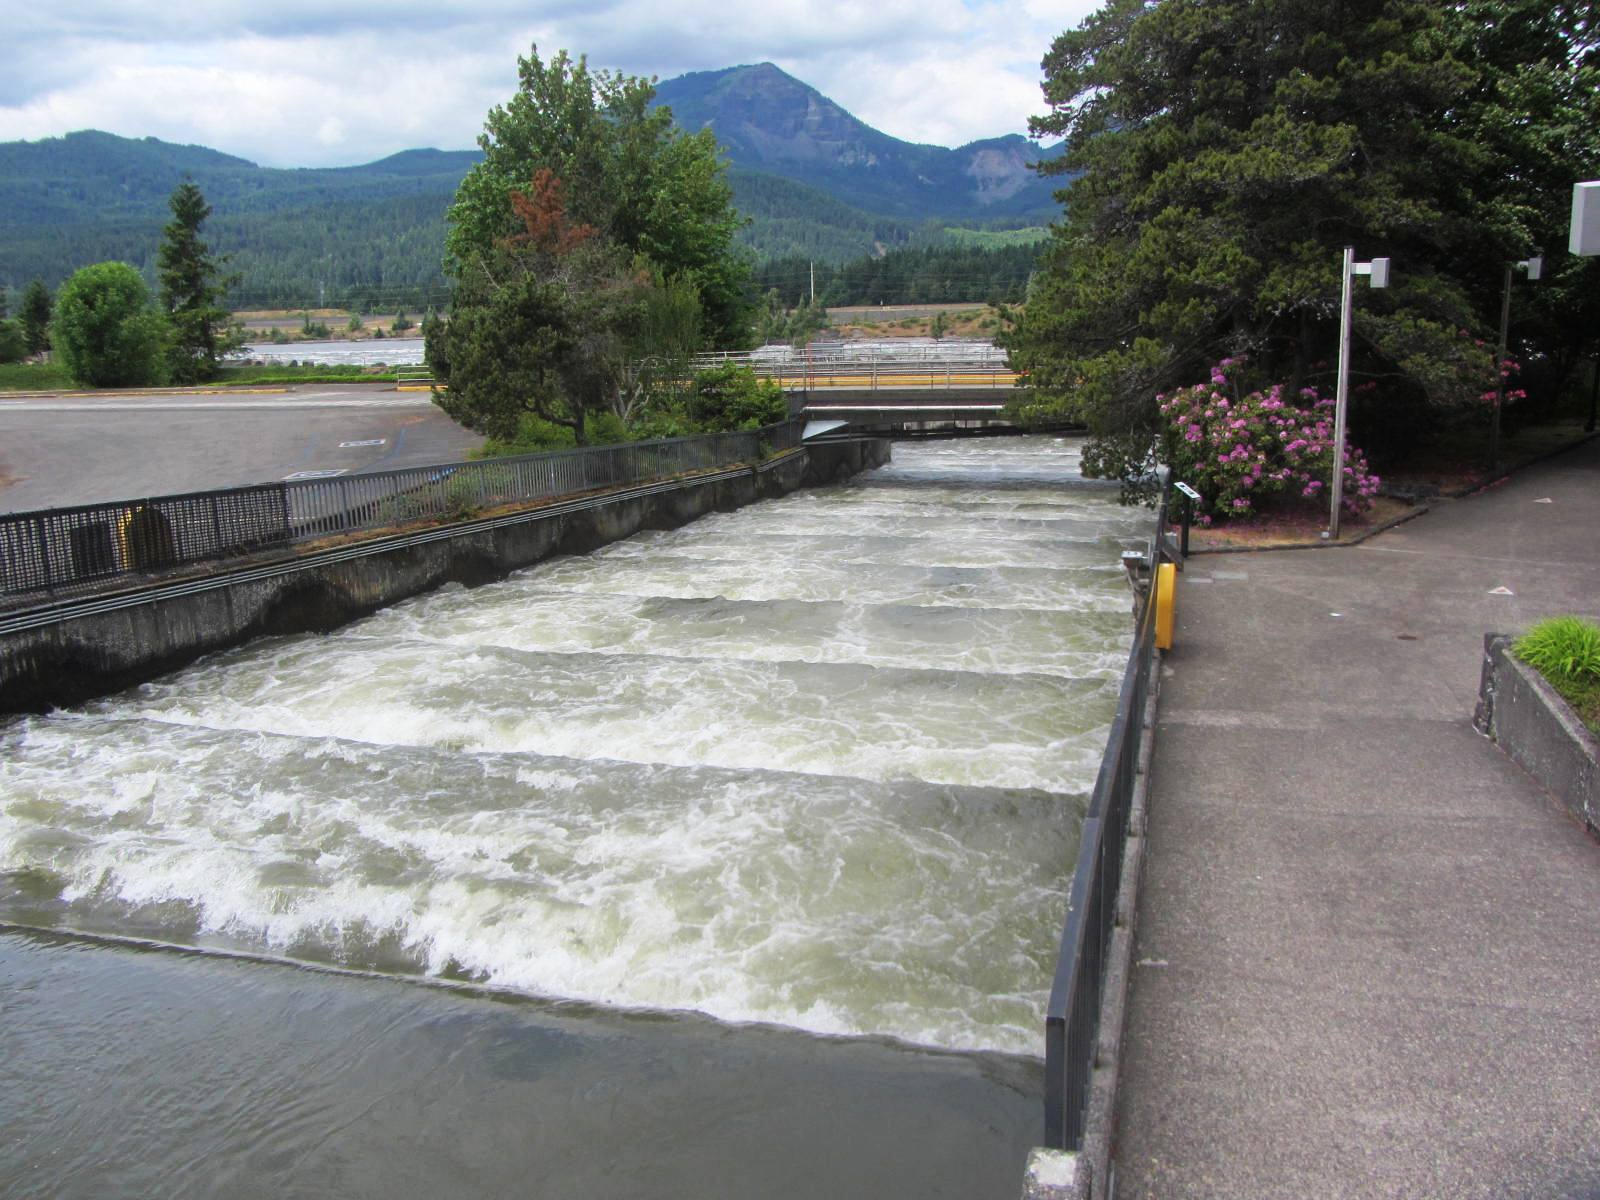 Fish_ladder_Bonneville_Dam_Columbia_River_Gorge